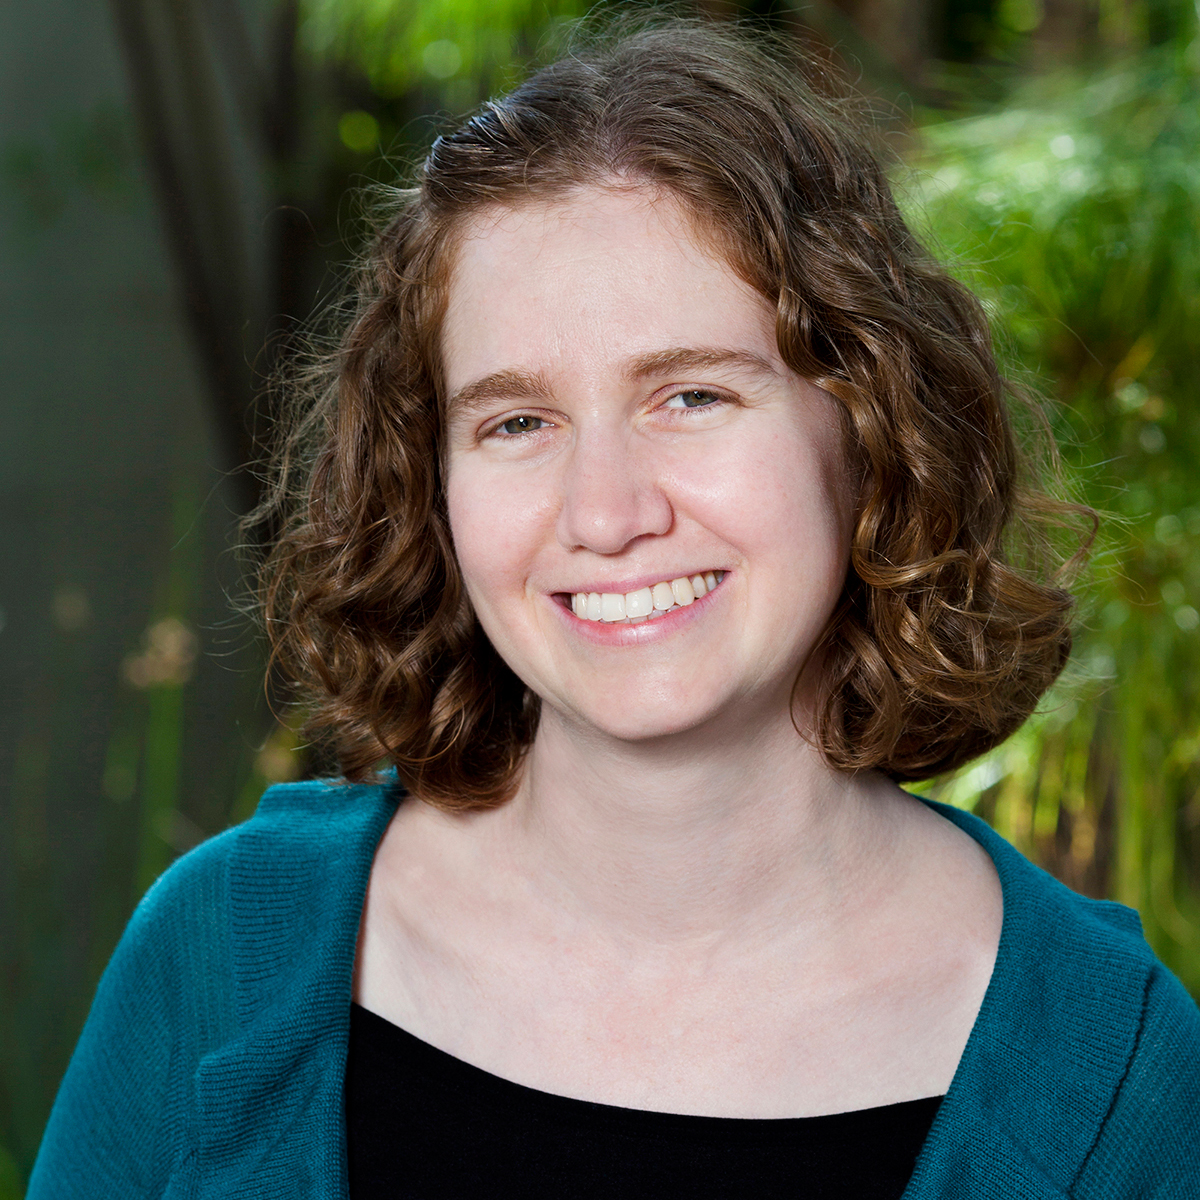 Sarah Bunin Benor